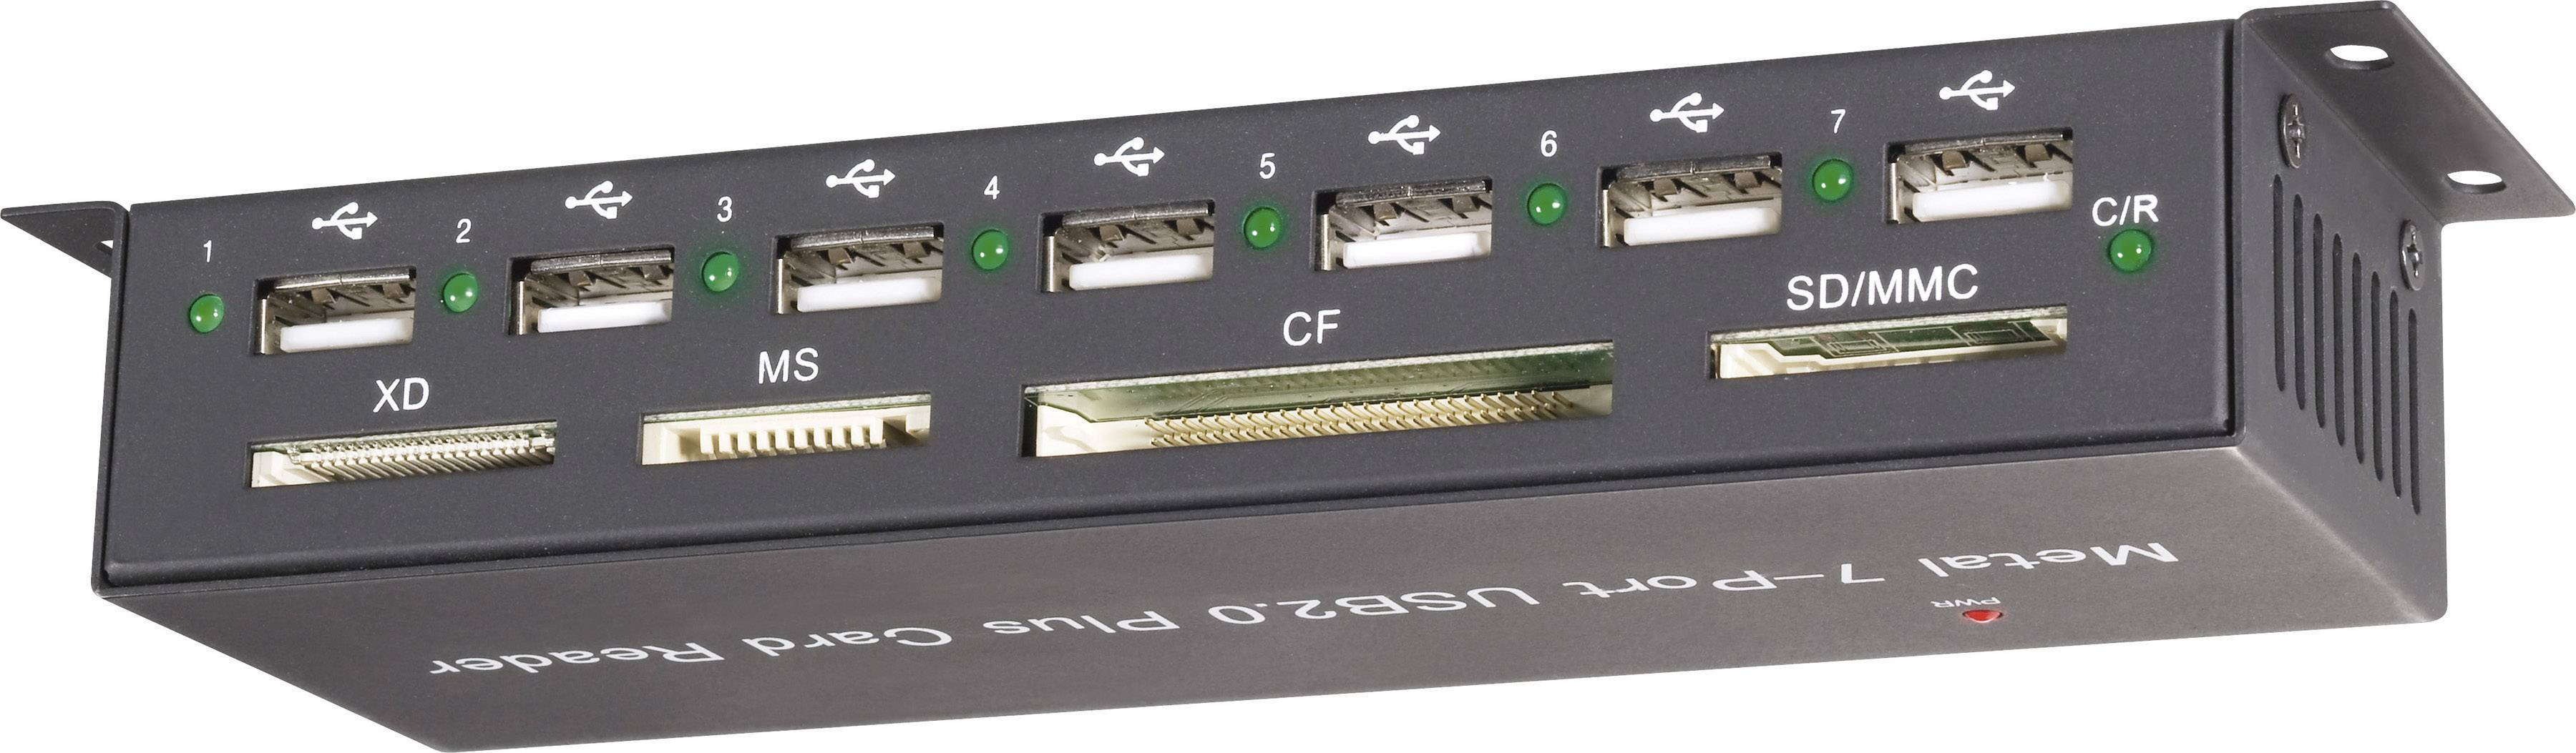 Externá čítačka pamäťových kariet/USB hub Renkforce CR09e-Hub, USB 2.0, čierna